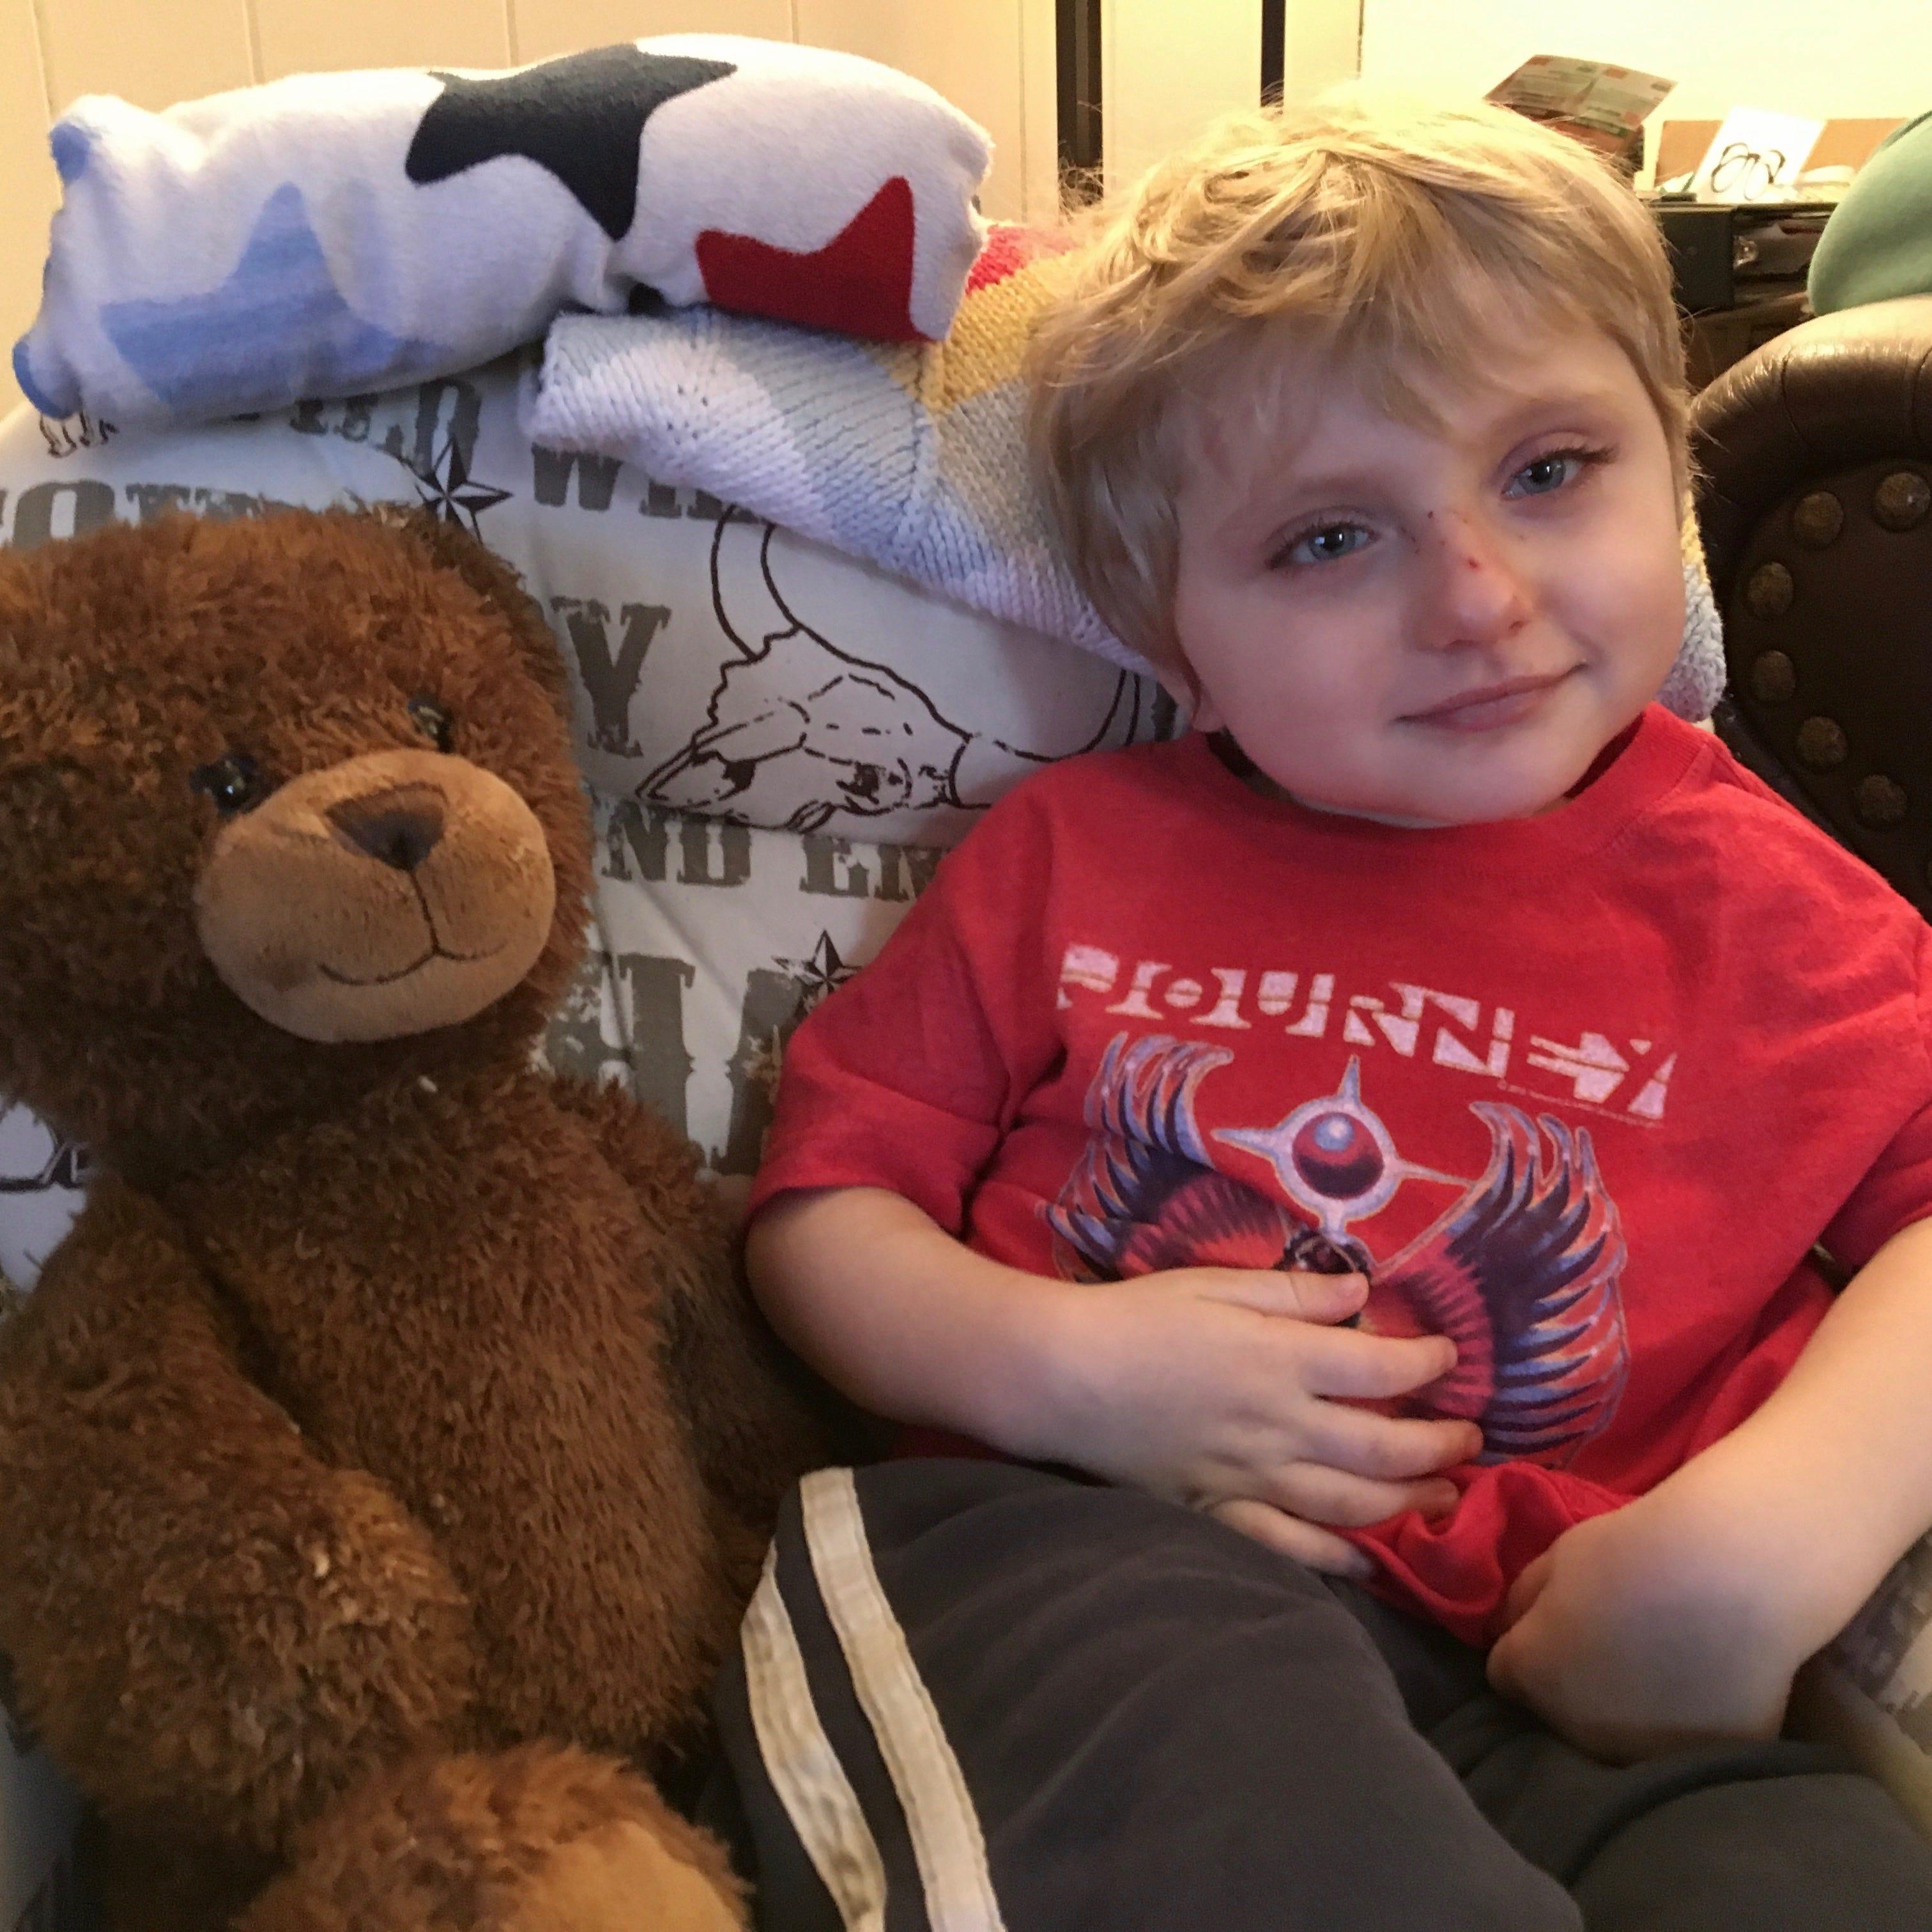 Staunton community rallies to help boy's family